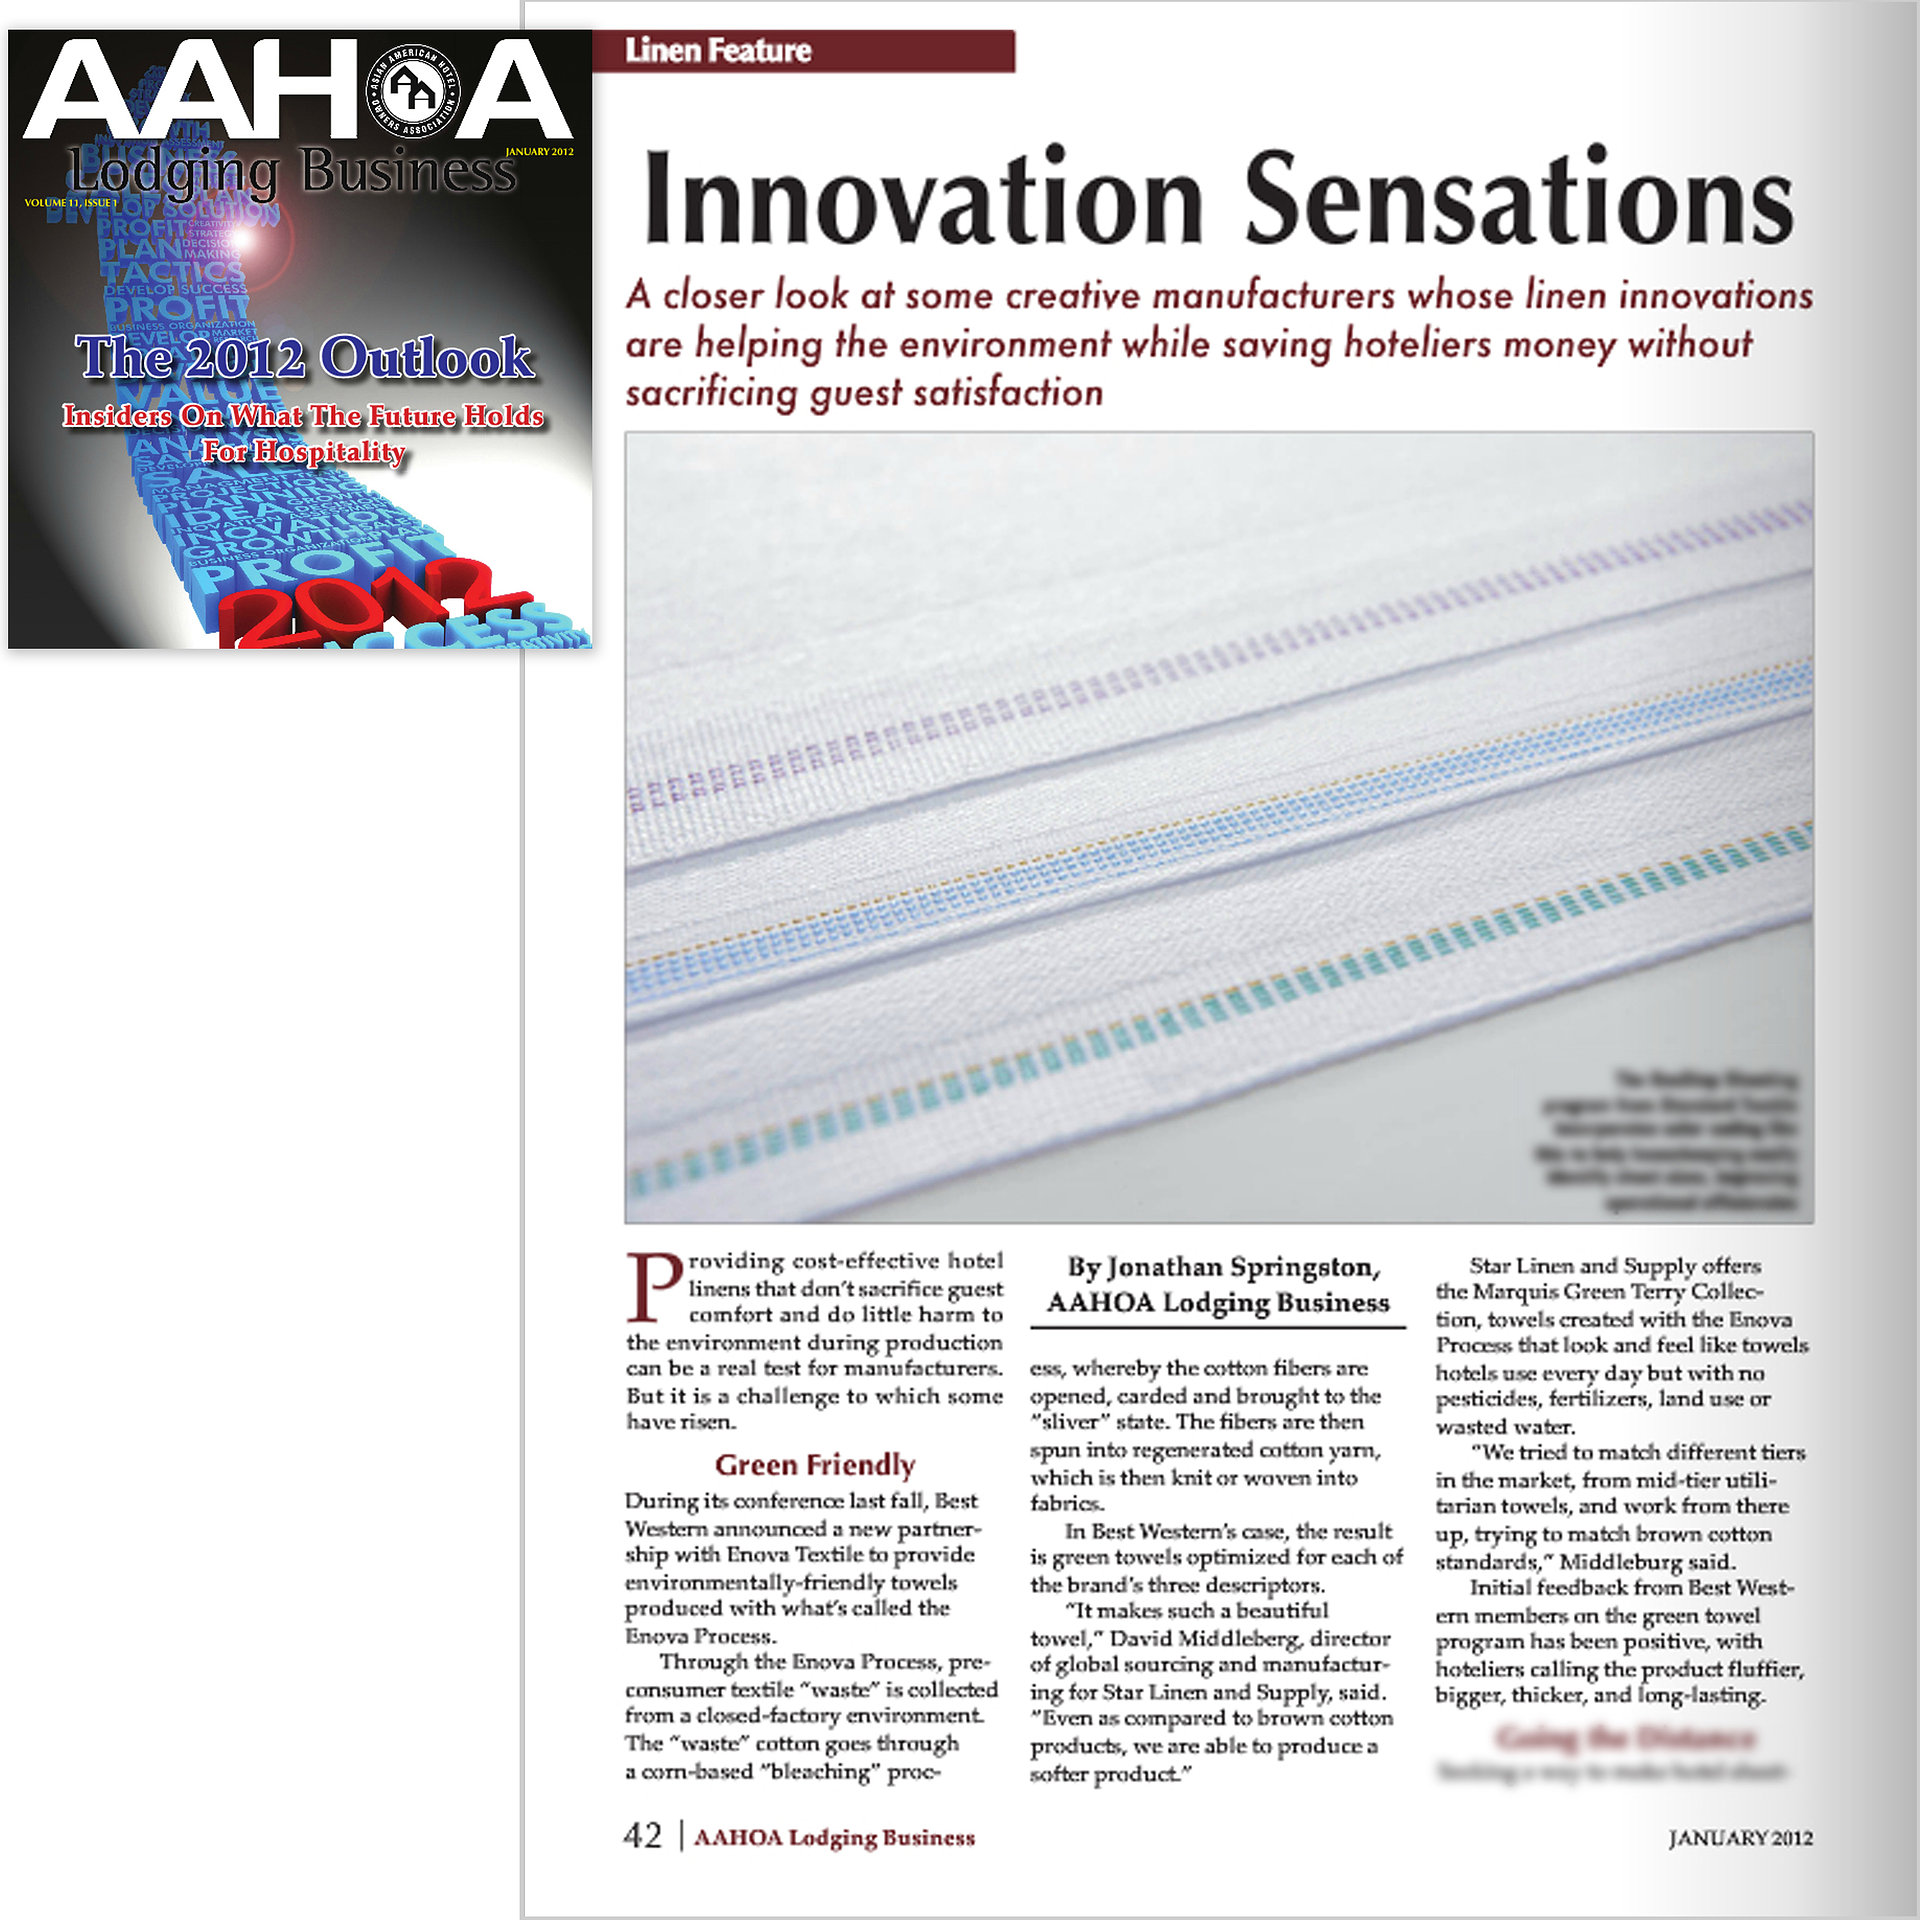 AAHOA Magazine Jan'12 Linen Feature